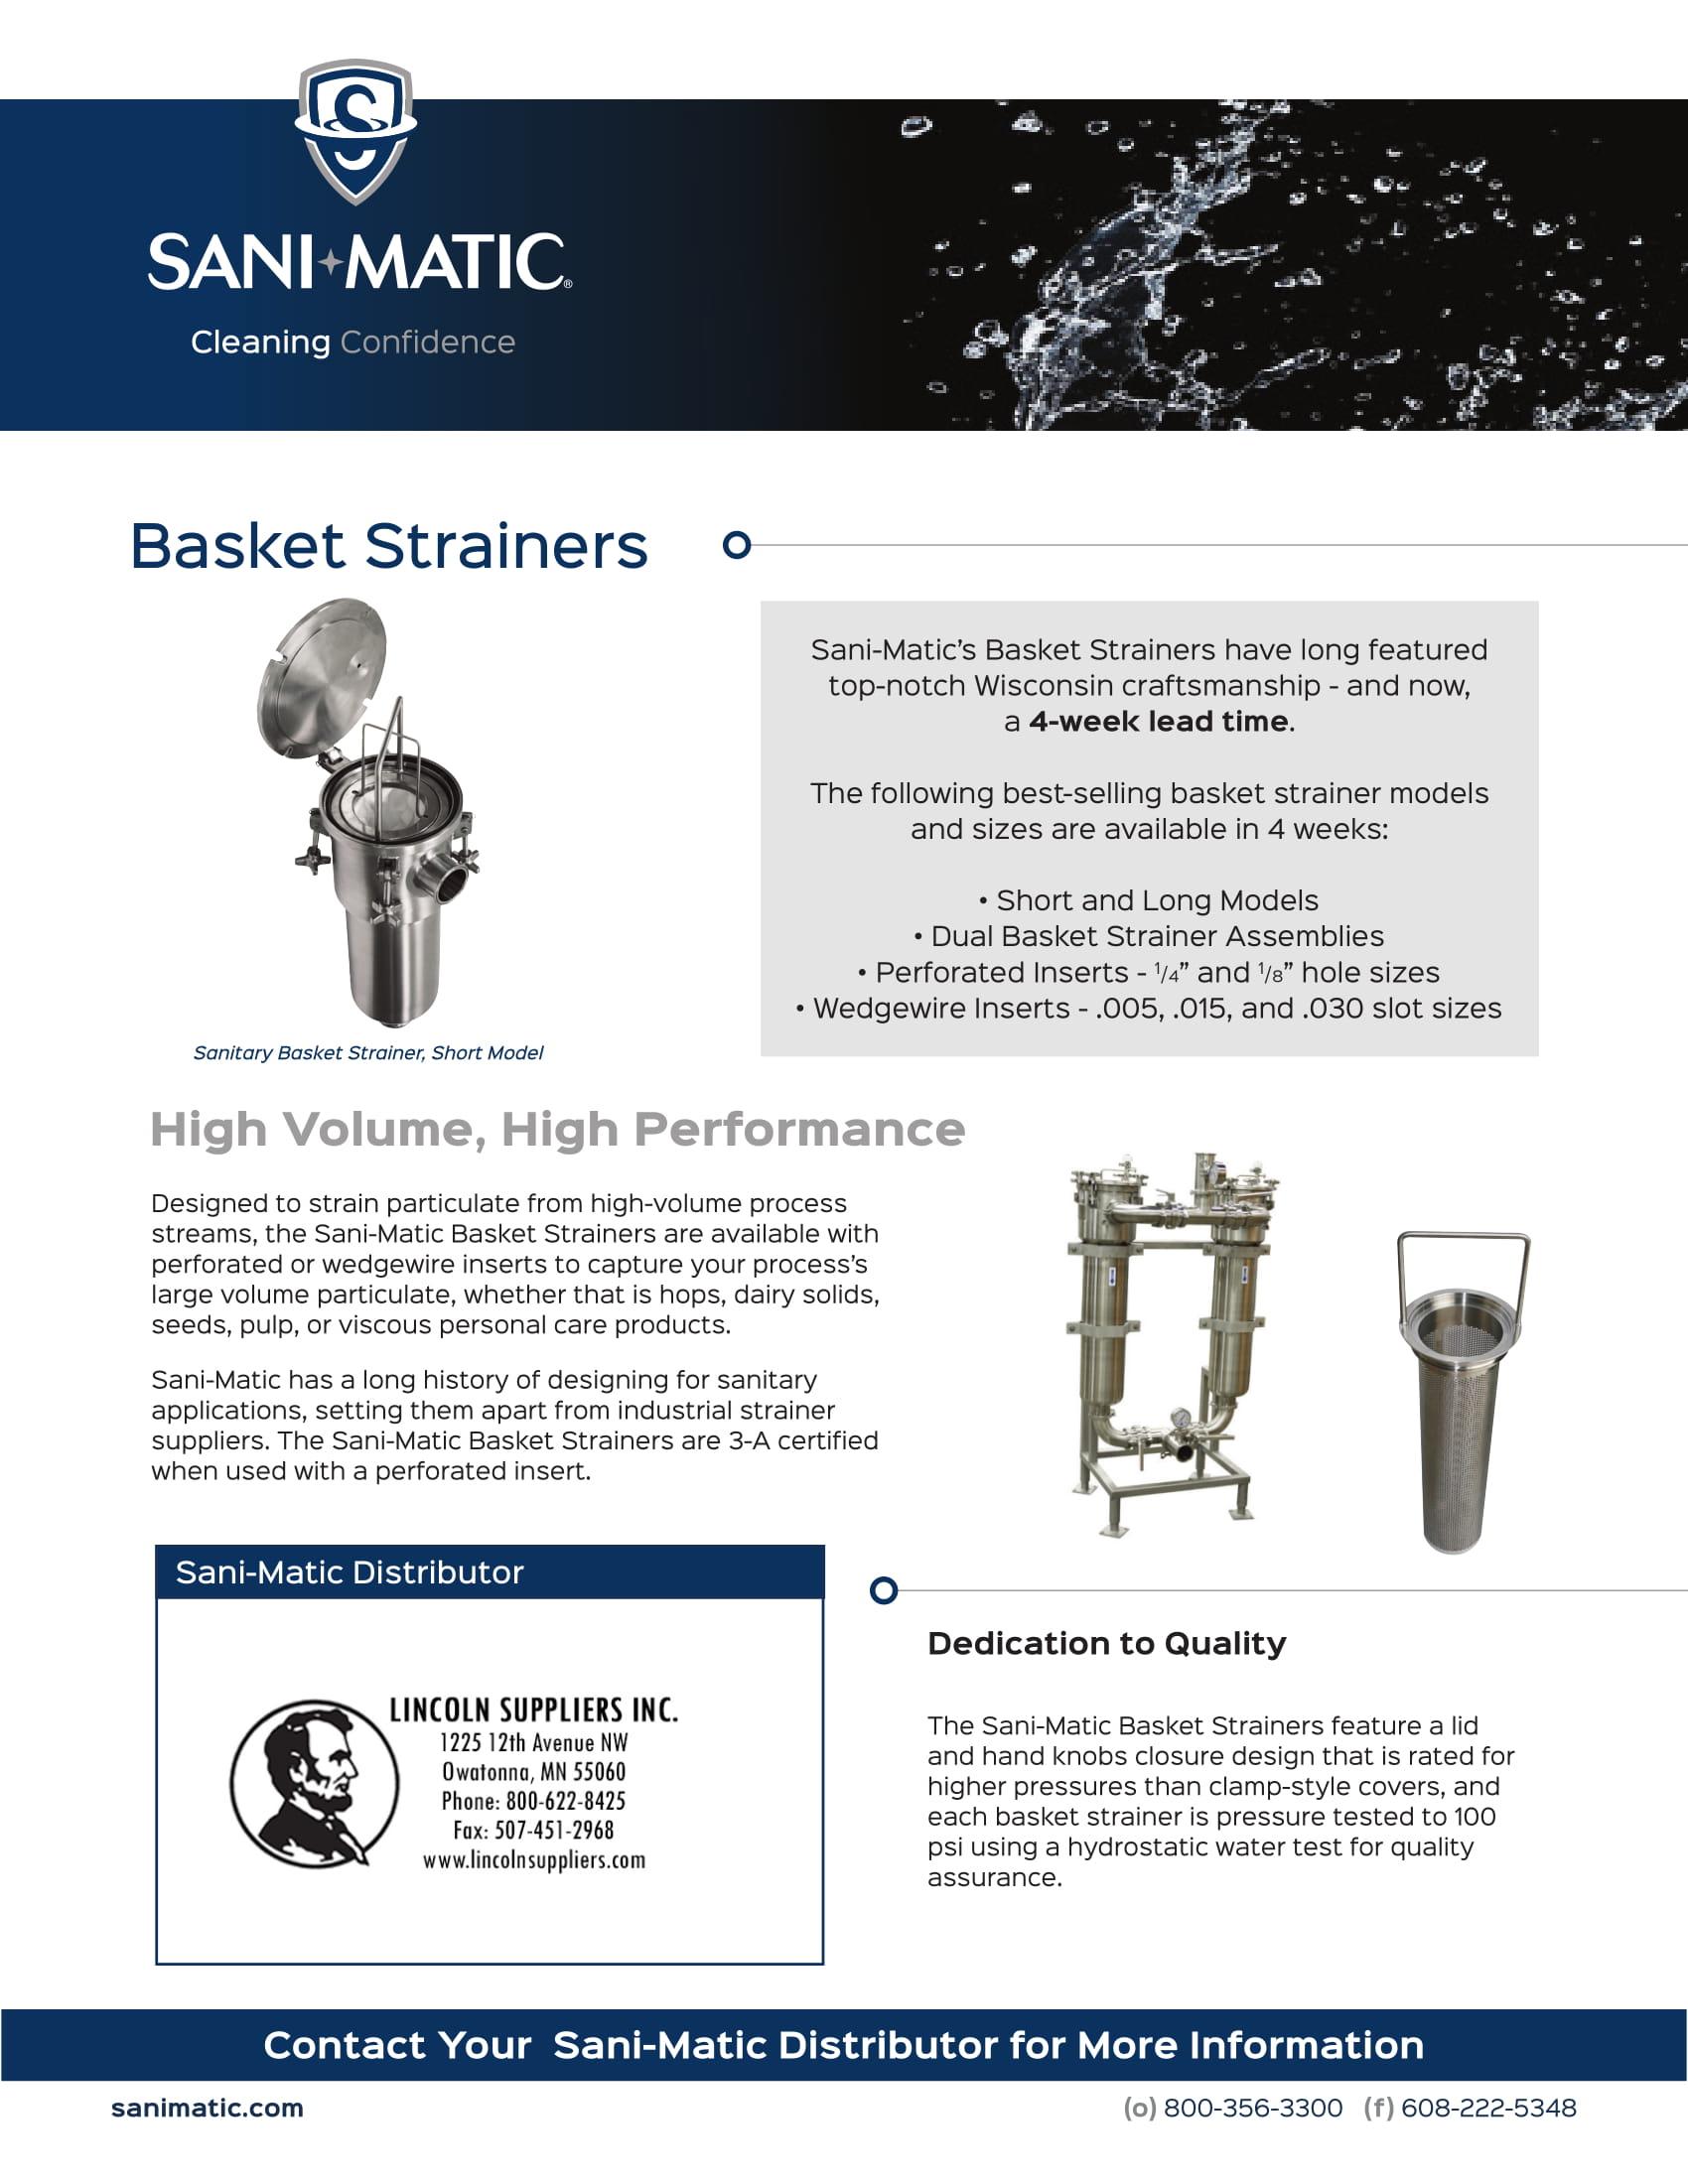 Sani-Matic's Basket Strainer Distributor